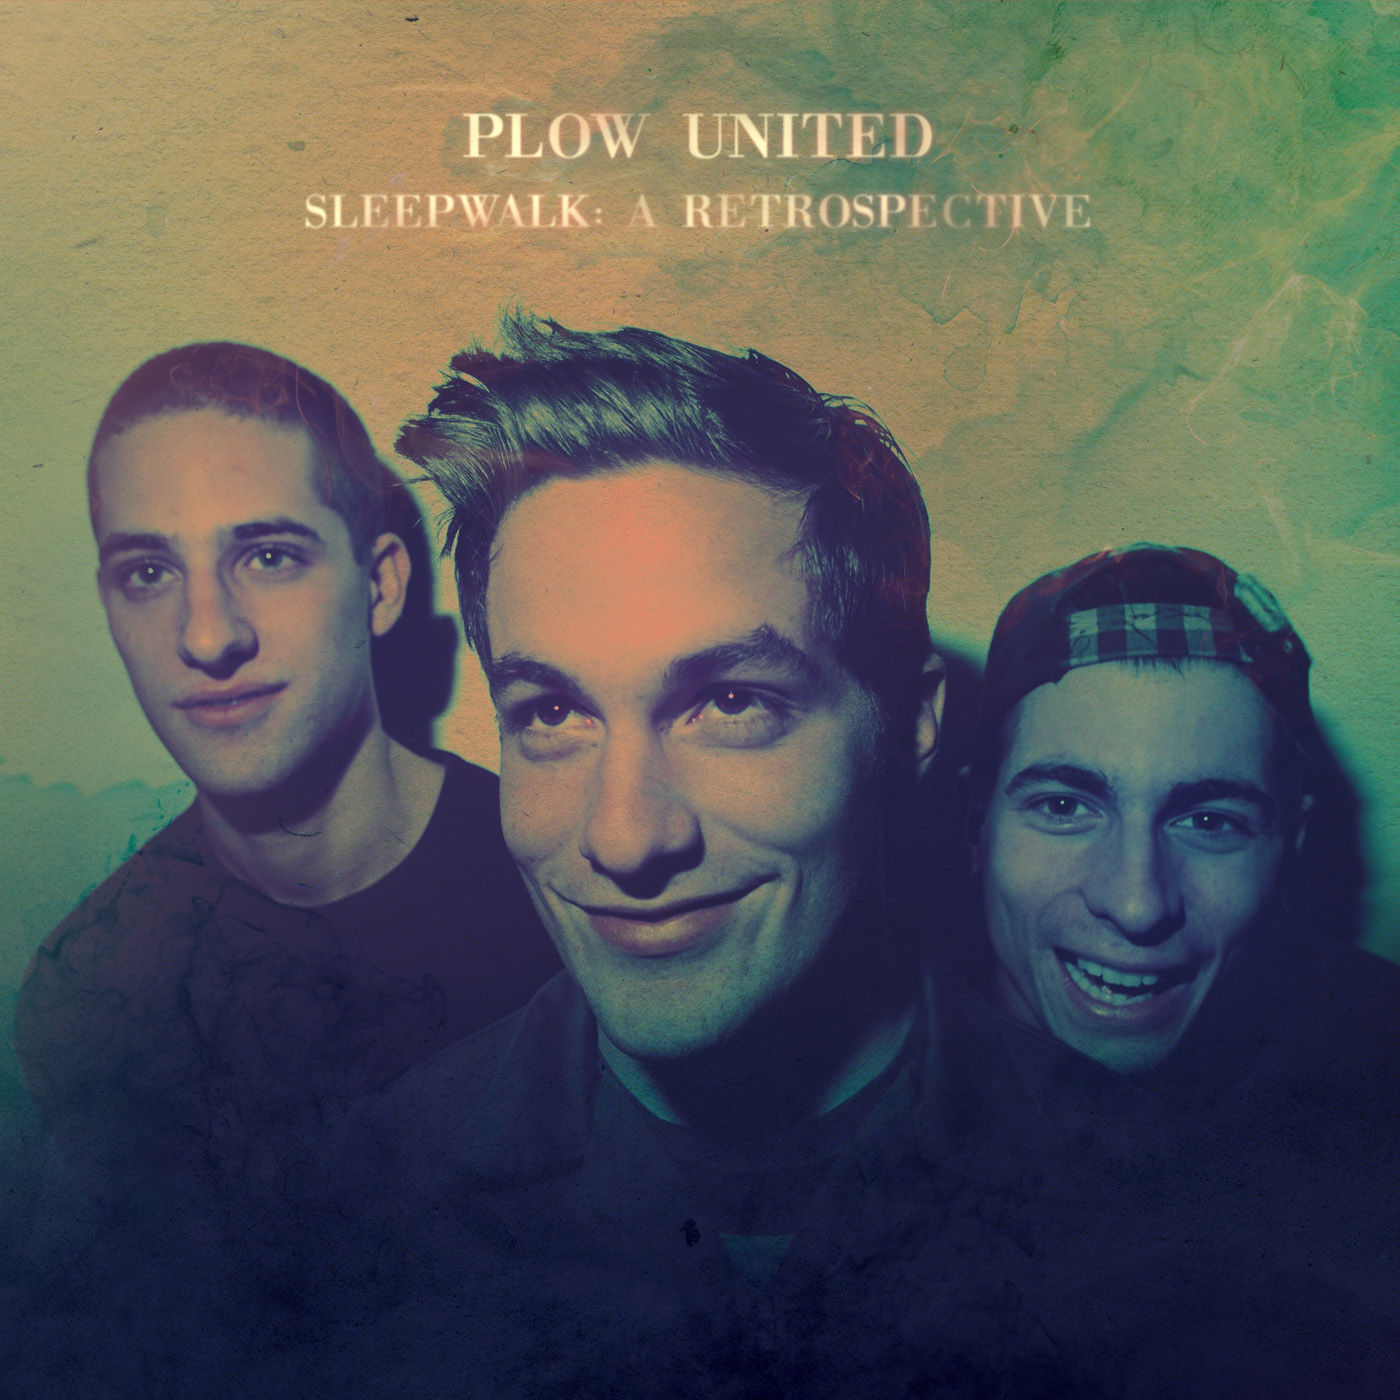 Plow United - Sleepwalk: A Retrospective Digital Download